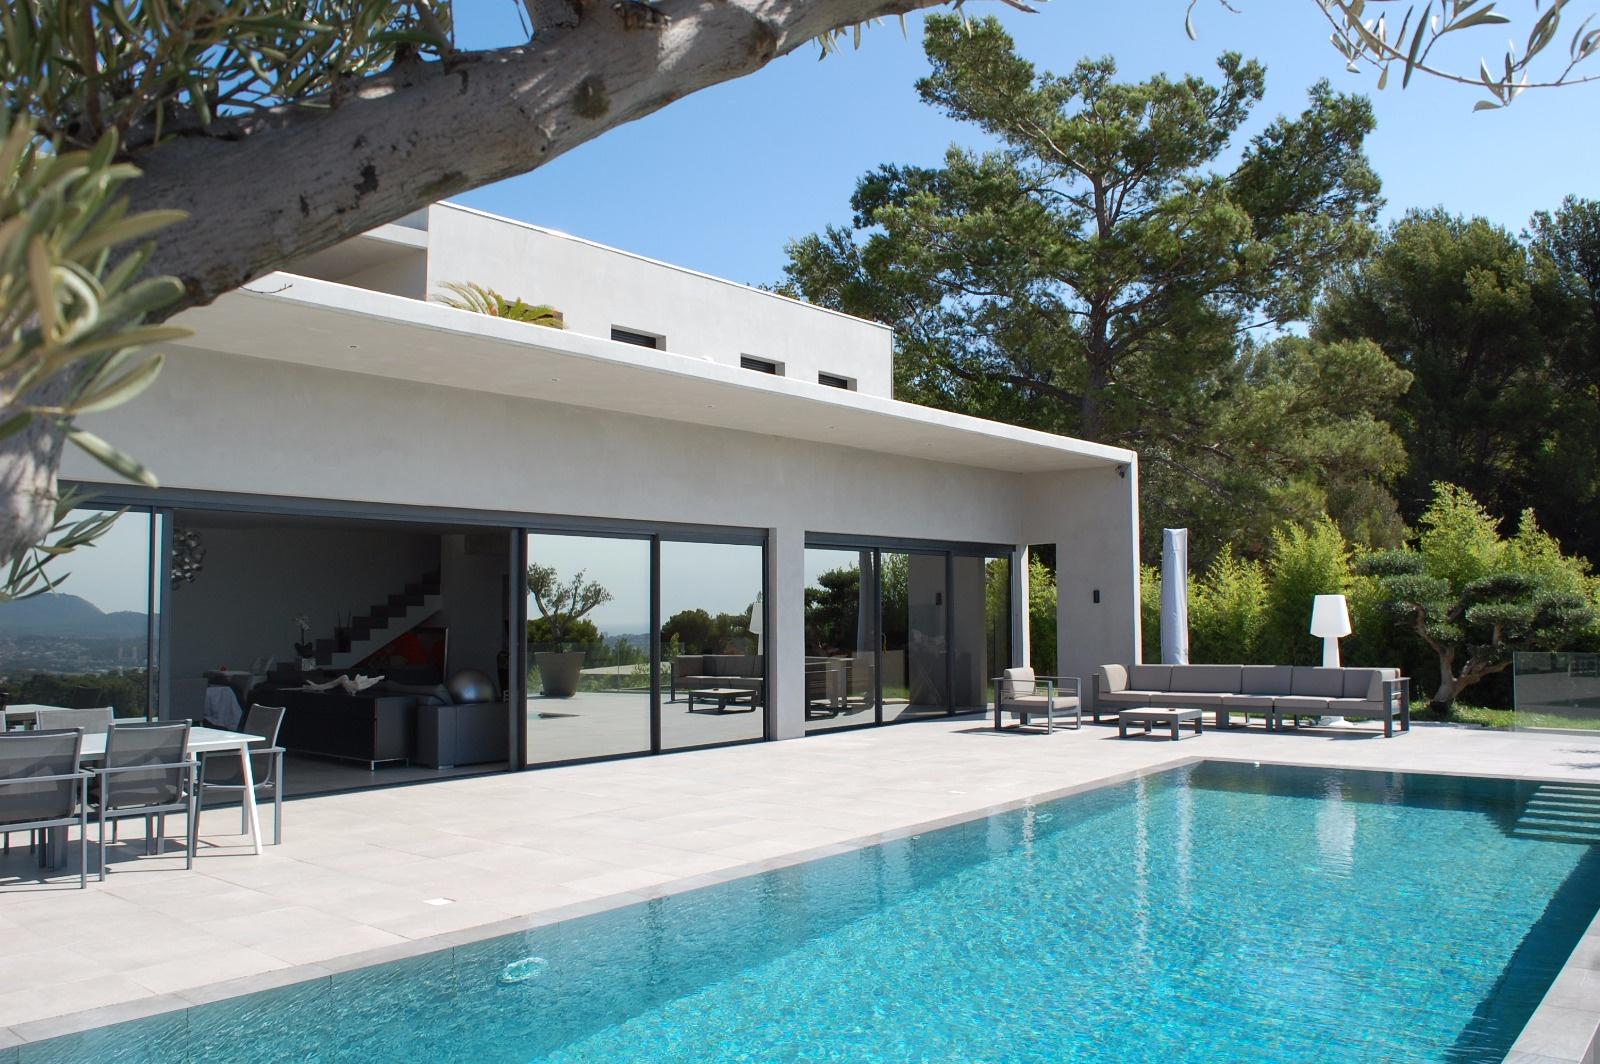 vente ollioules maison contemporaine vue mer panoramique. Black Bedroom Furniture Sets. Home Design Ideas